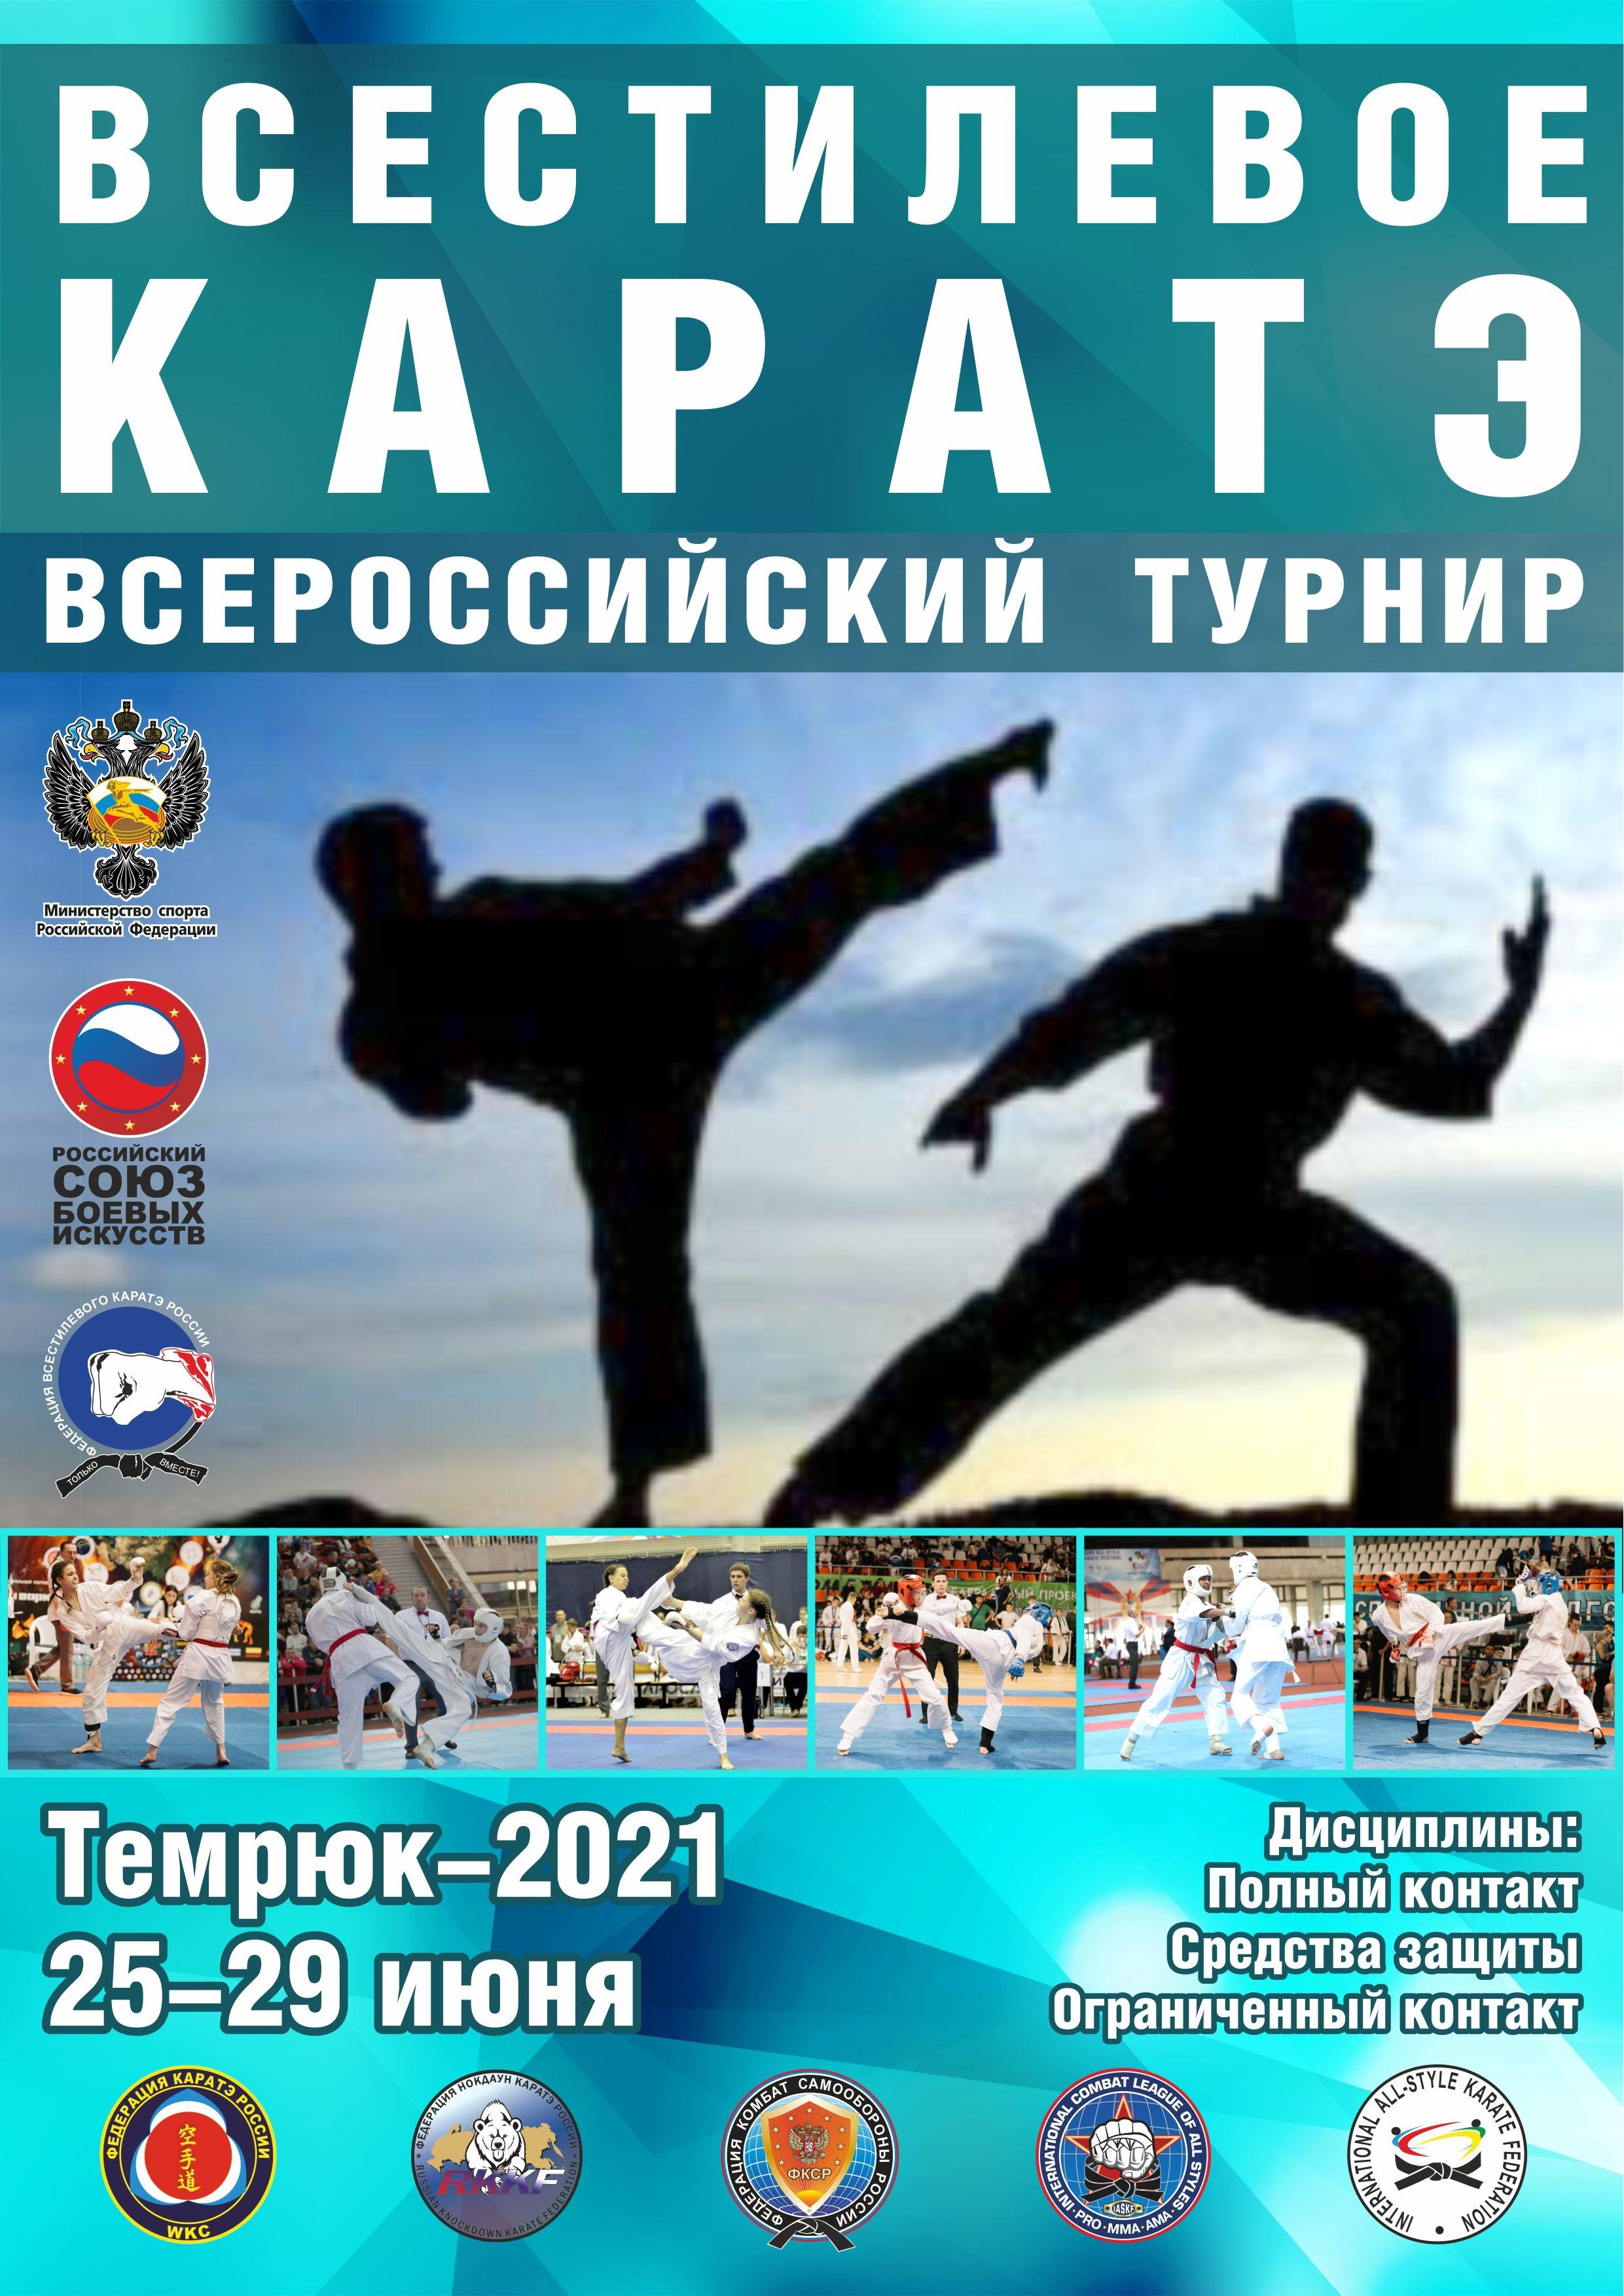 http://combatsd.com/images/upload/Афиша%20Темрюк-21.jpg